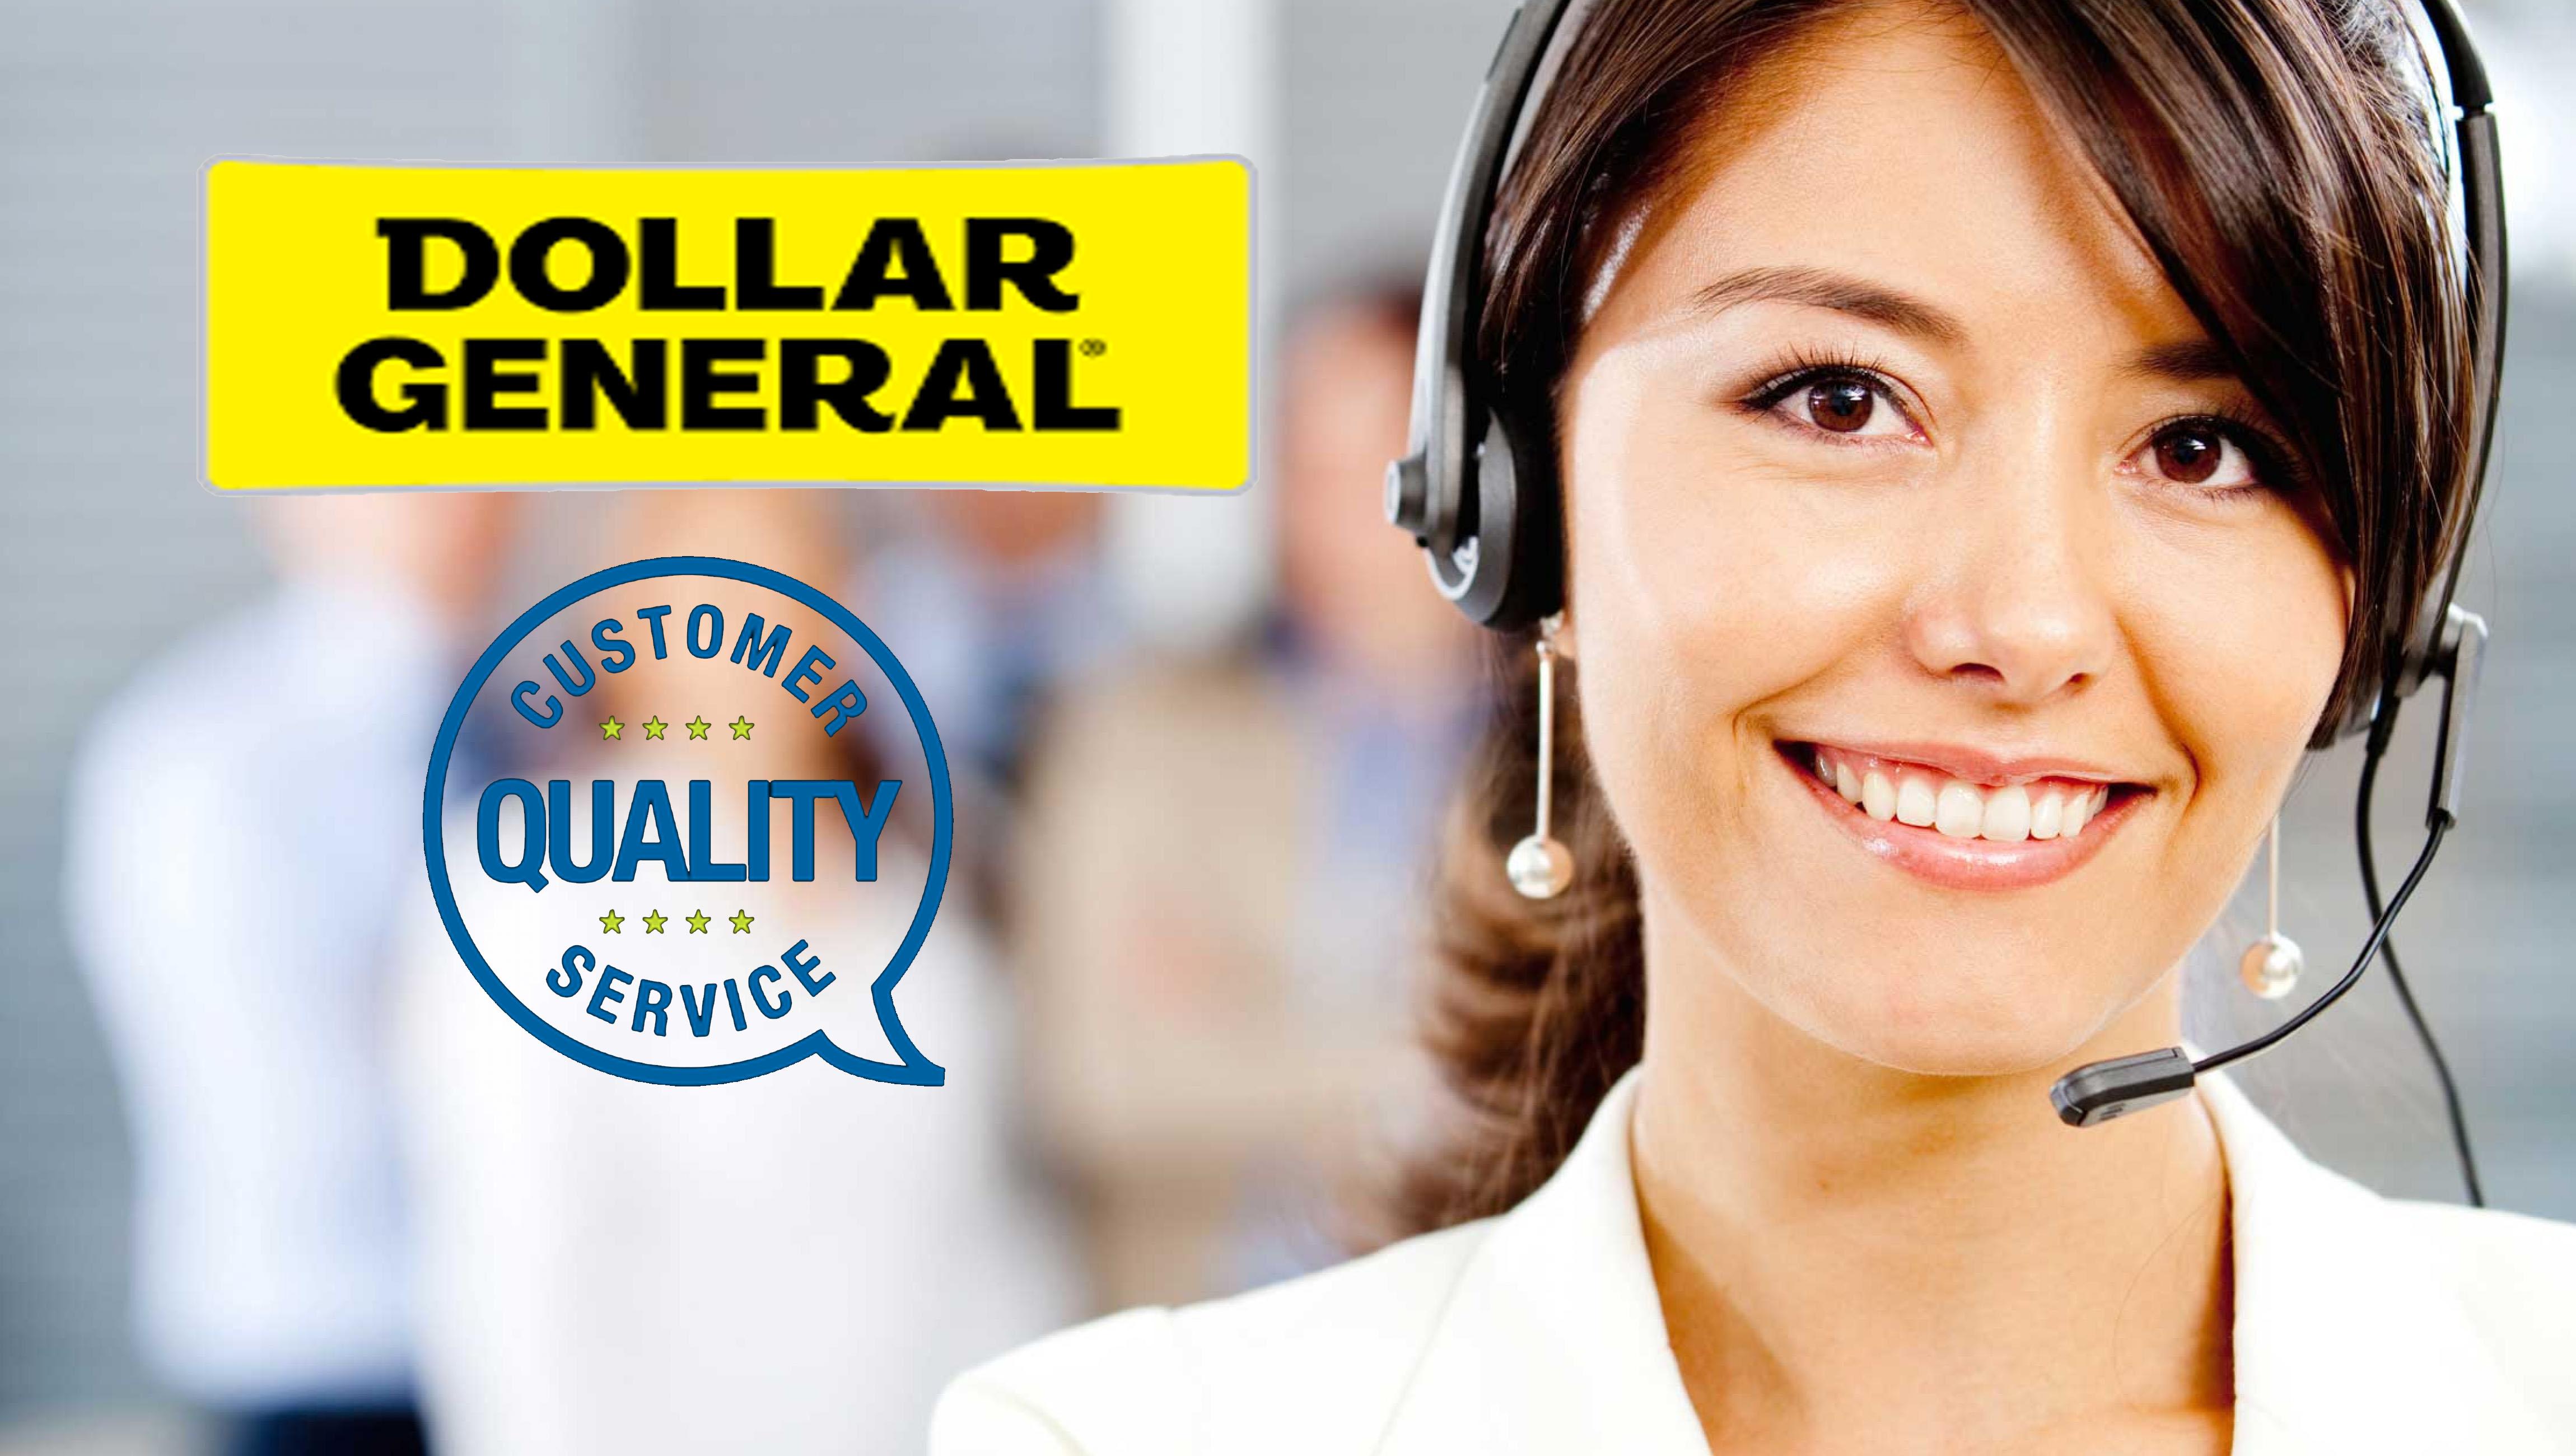 Dollar General customer services